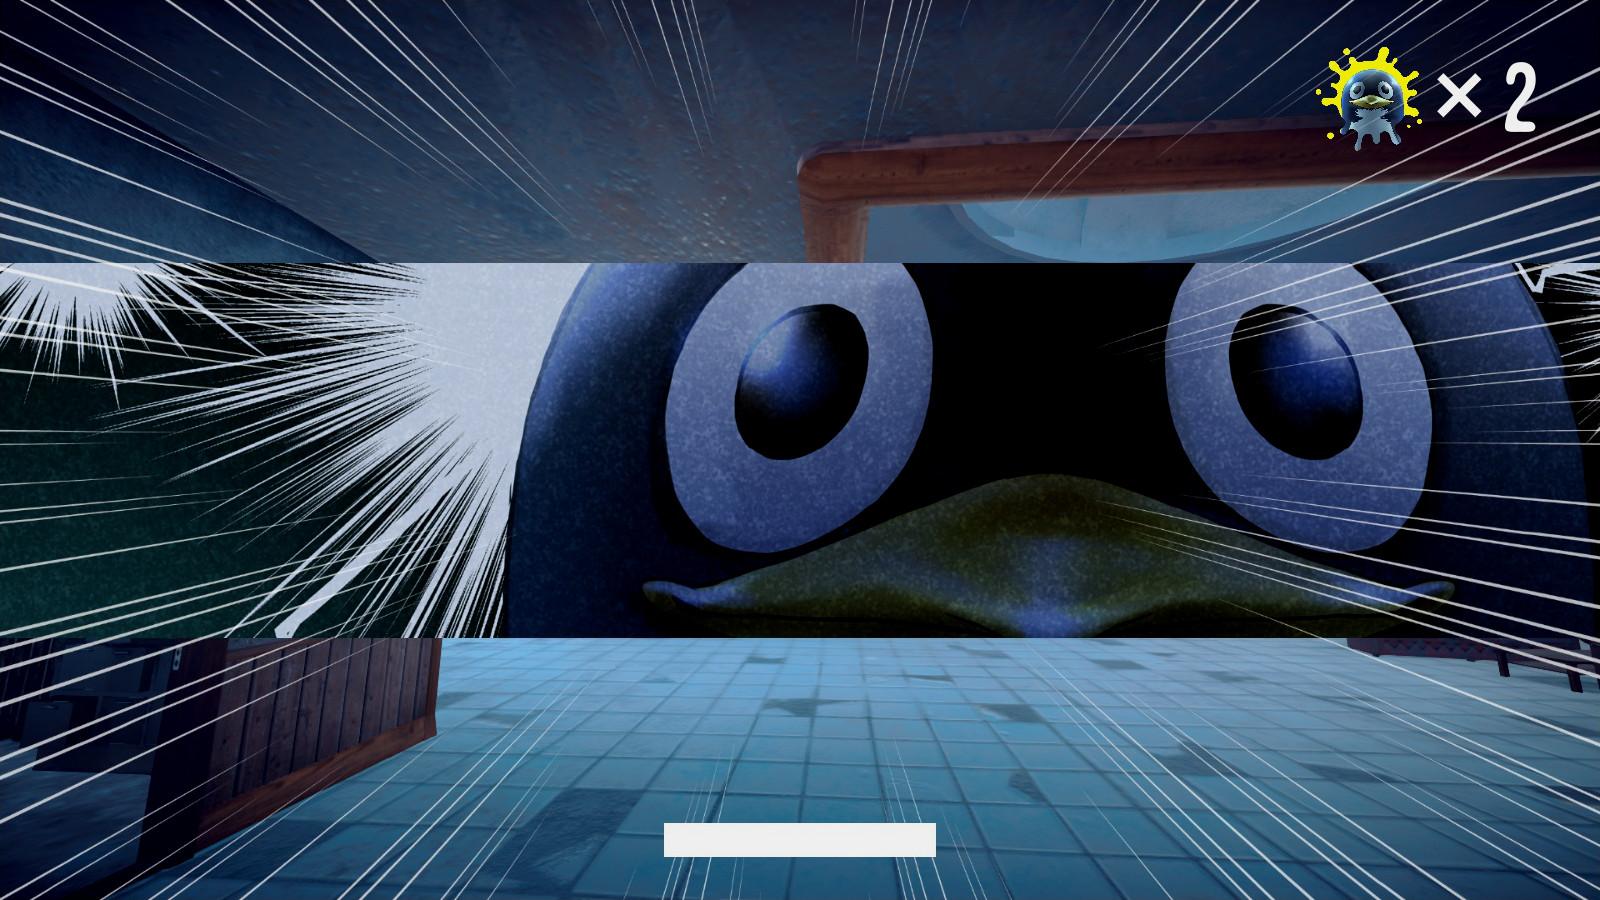 Penguin's Dogma|獄門ペンギン screenshot